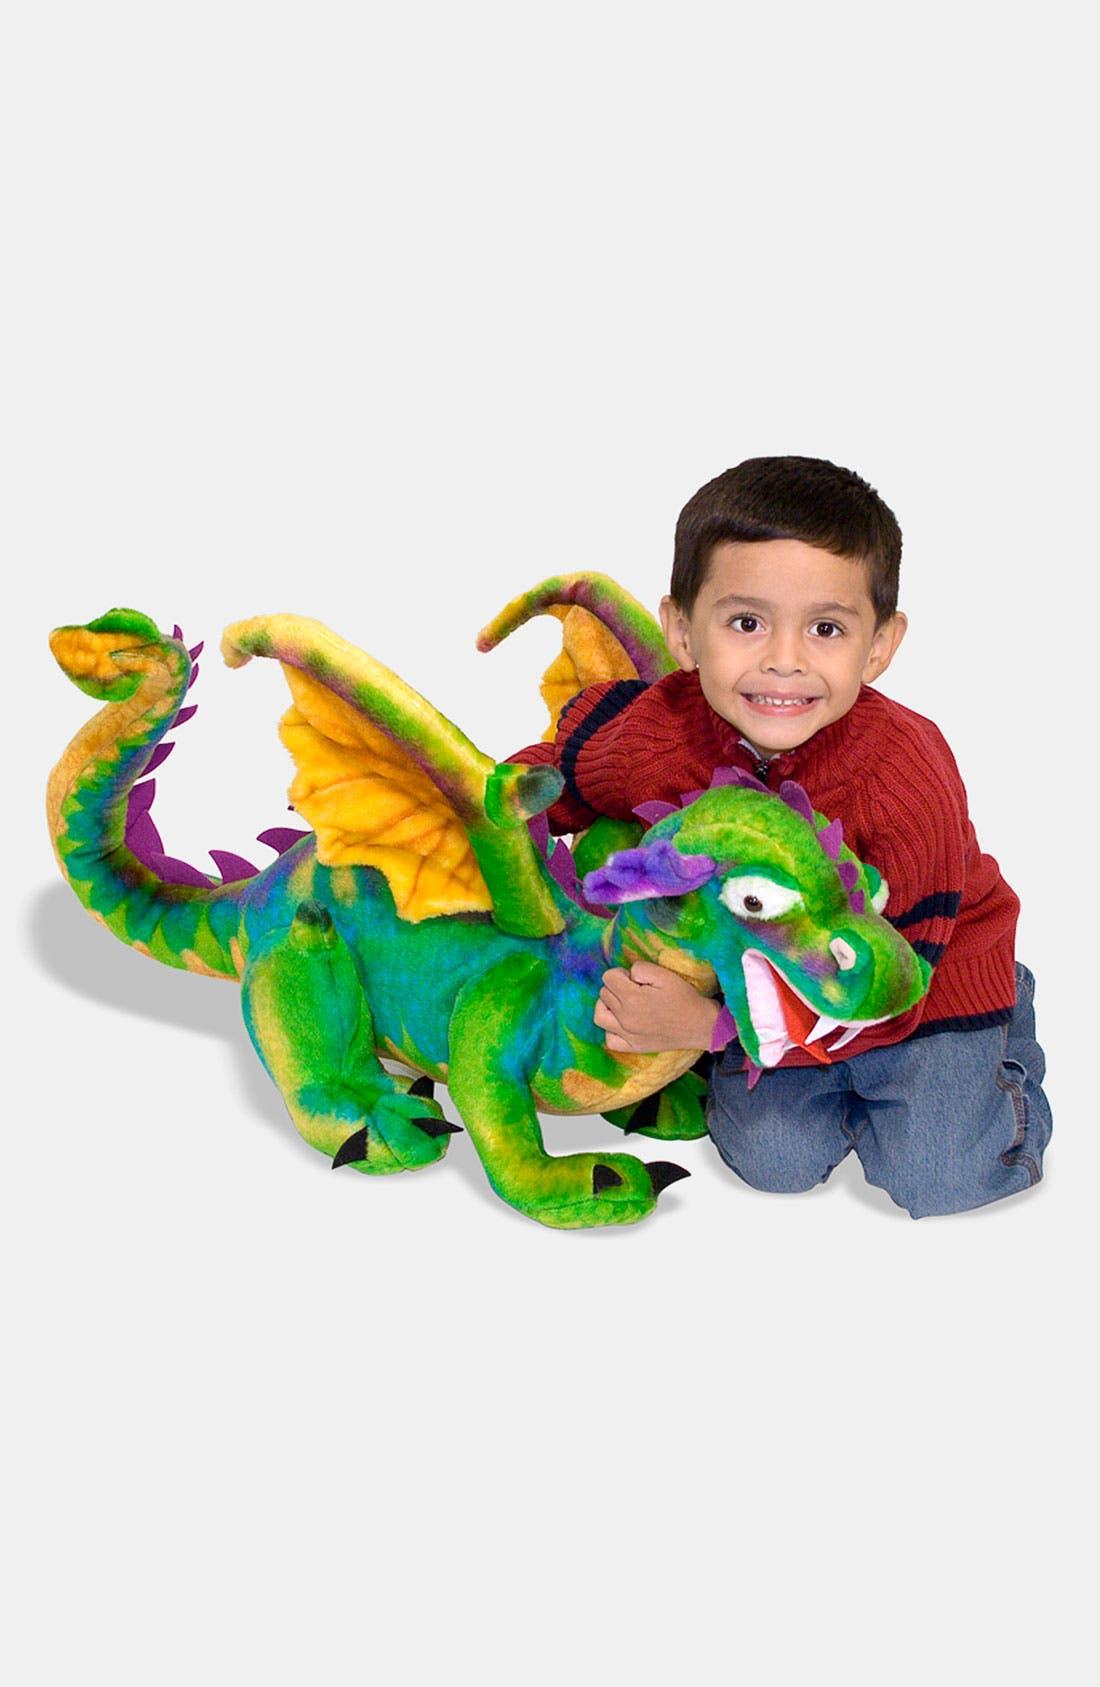 Alternate Image 1 Selected - Melissa & Doug Oversized Plush Stuffed Dragon